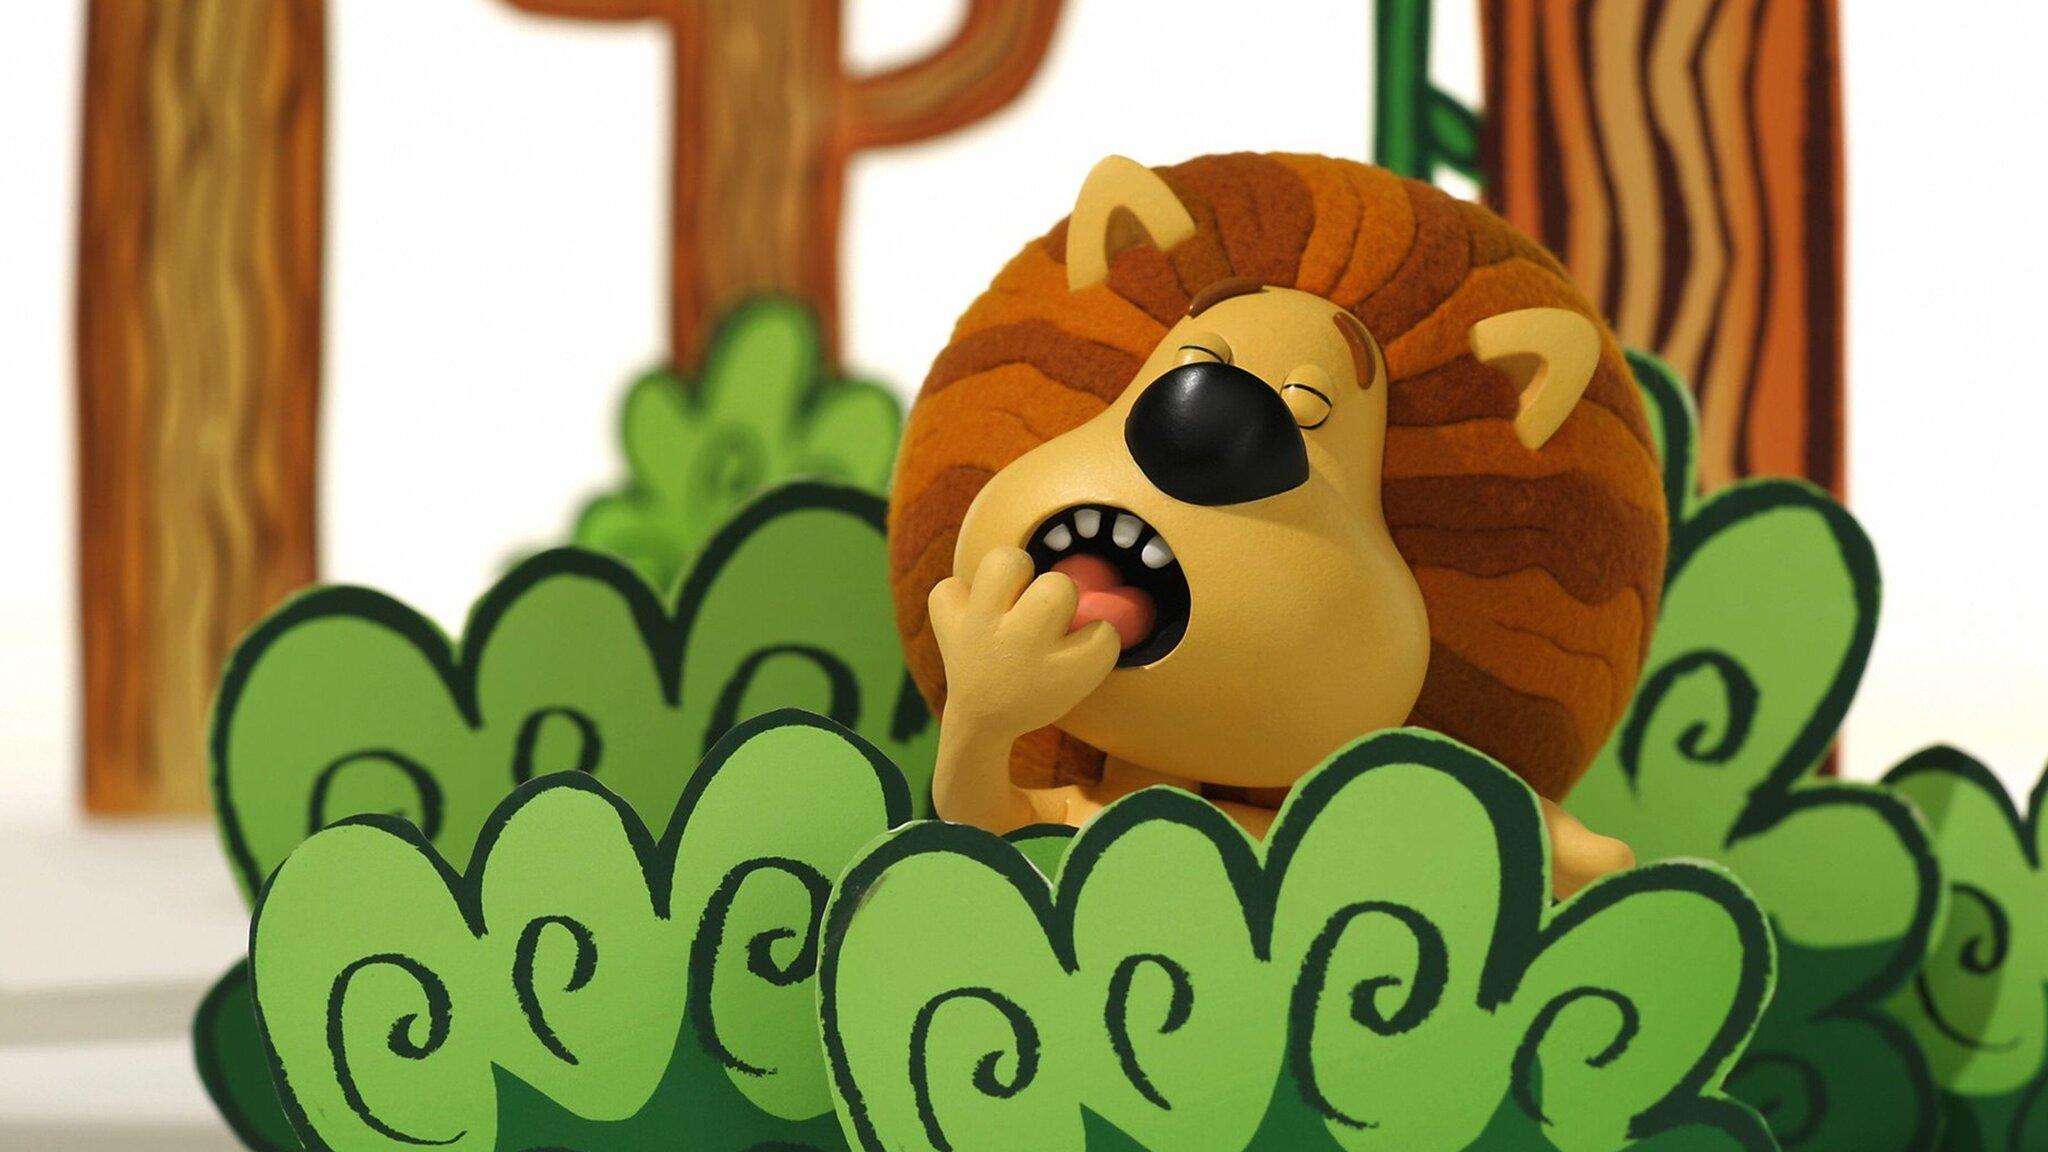 Raa-Raa - lejonet som låter